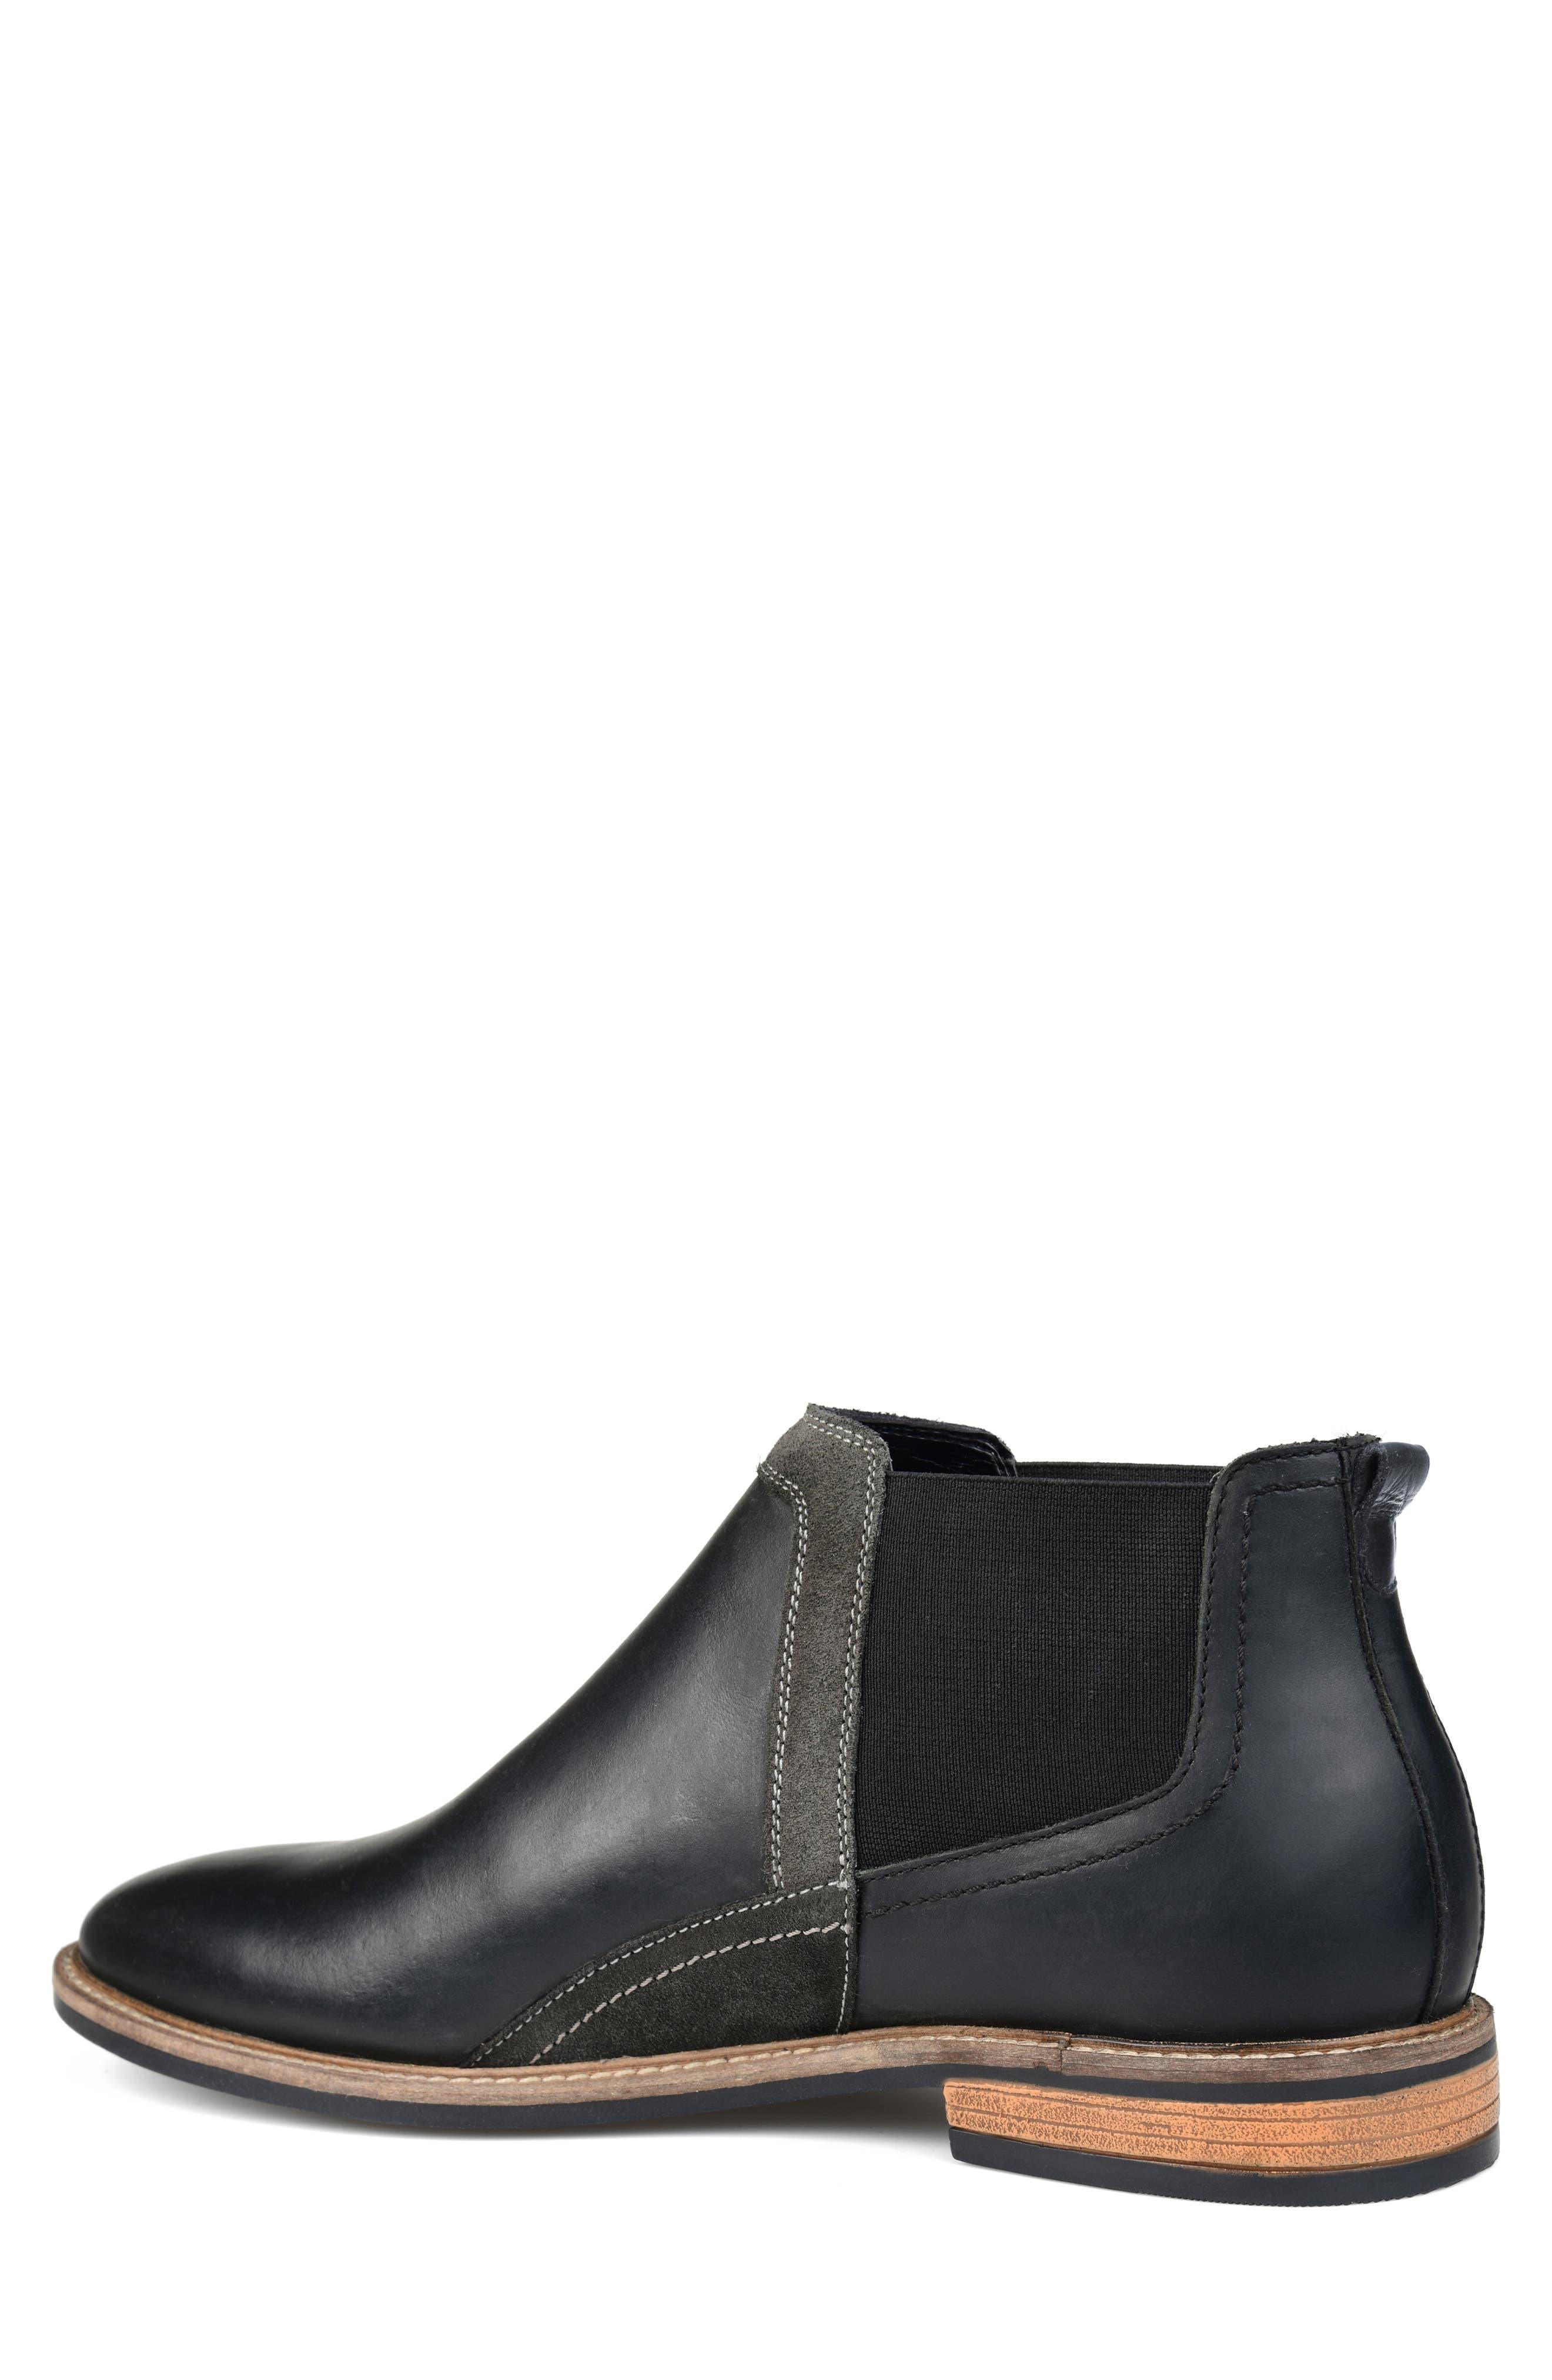 THOMAS AND VINE, Beckham Chelsea Boot, Alternate thumbnail 2, color, BLACK LEATHER